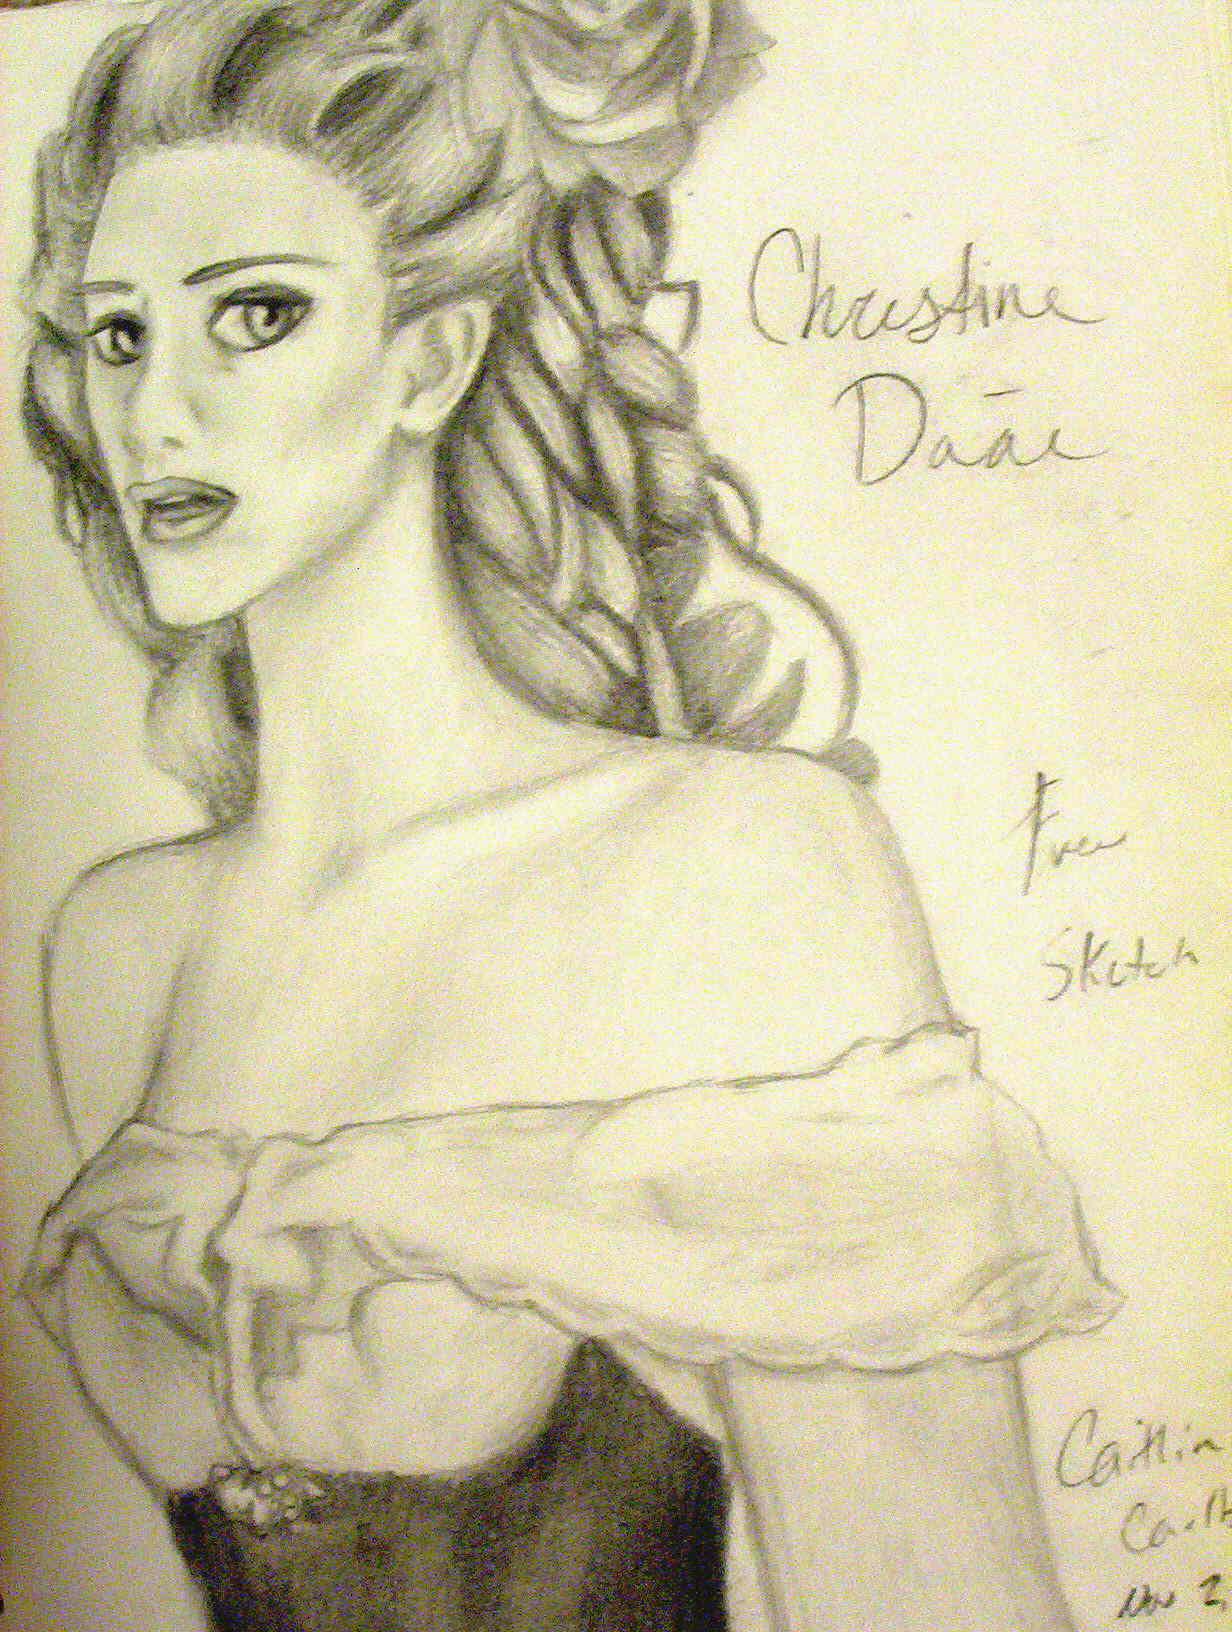 Christine Daae-- Free Sketch